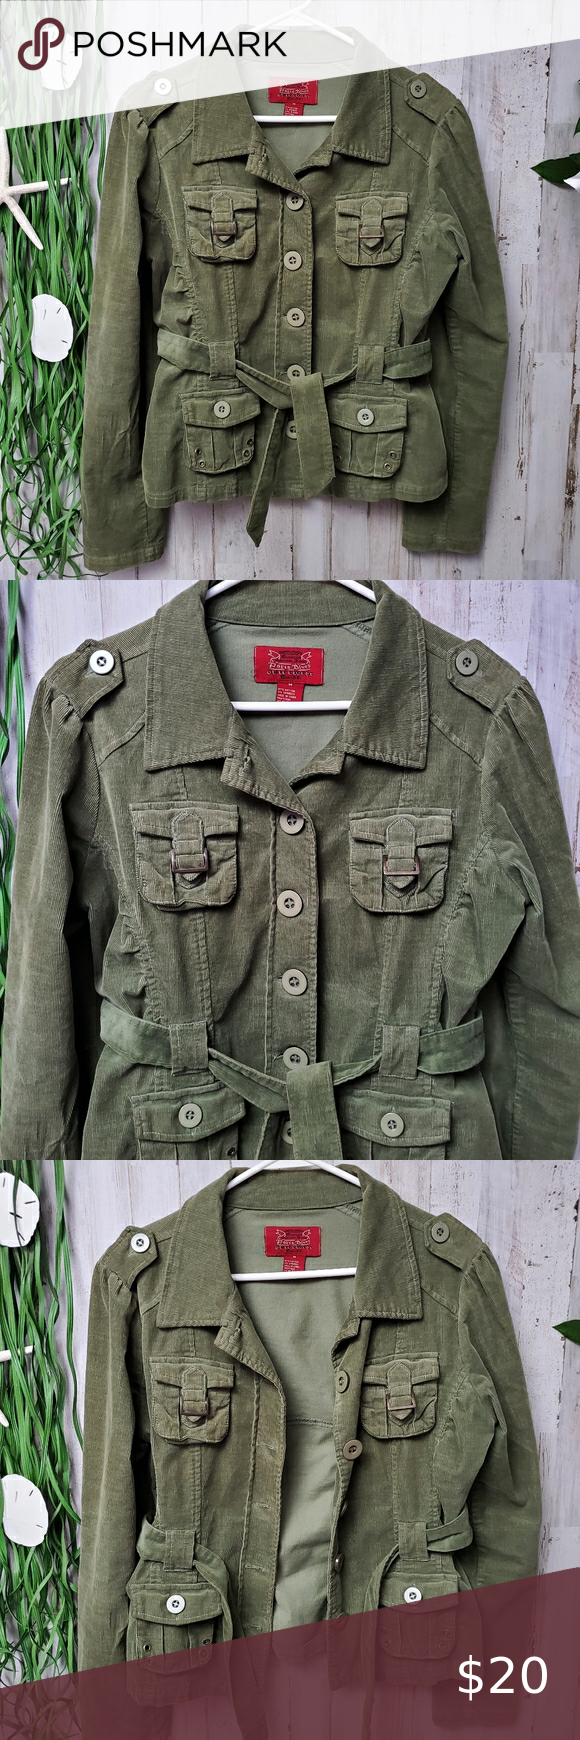 Paris Blues Green Corduroy Jacket Size Med Paris Blues Outerwear Green Corduroy Jacket Size Medium Pre Military Jacket Green Corduroy Jacket Paris Blues [ 1740 x 580 Pixel ]